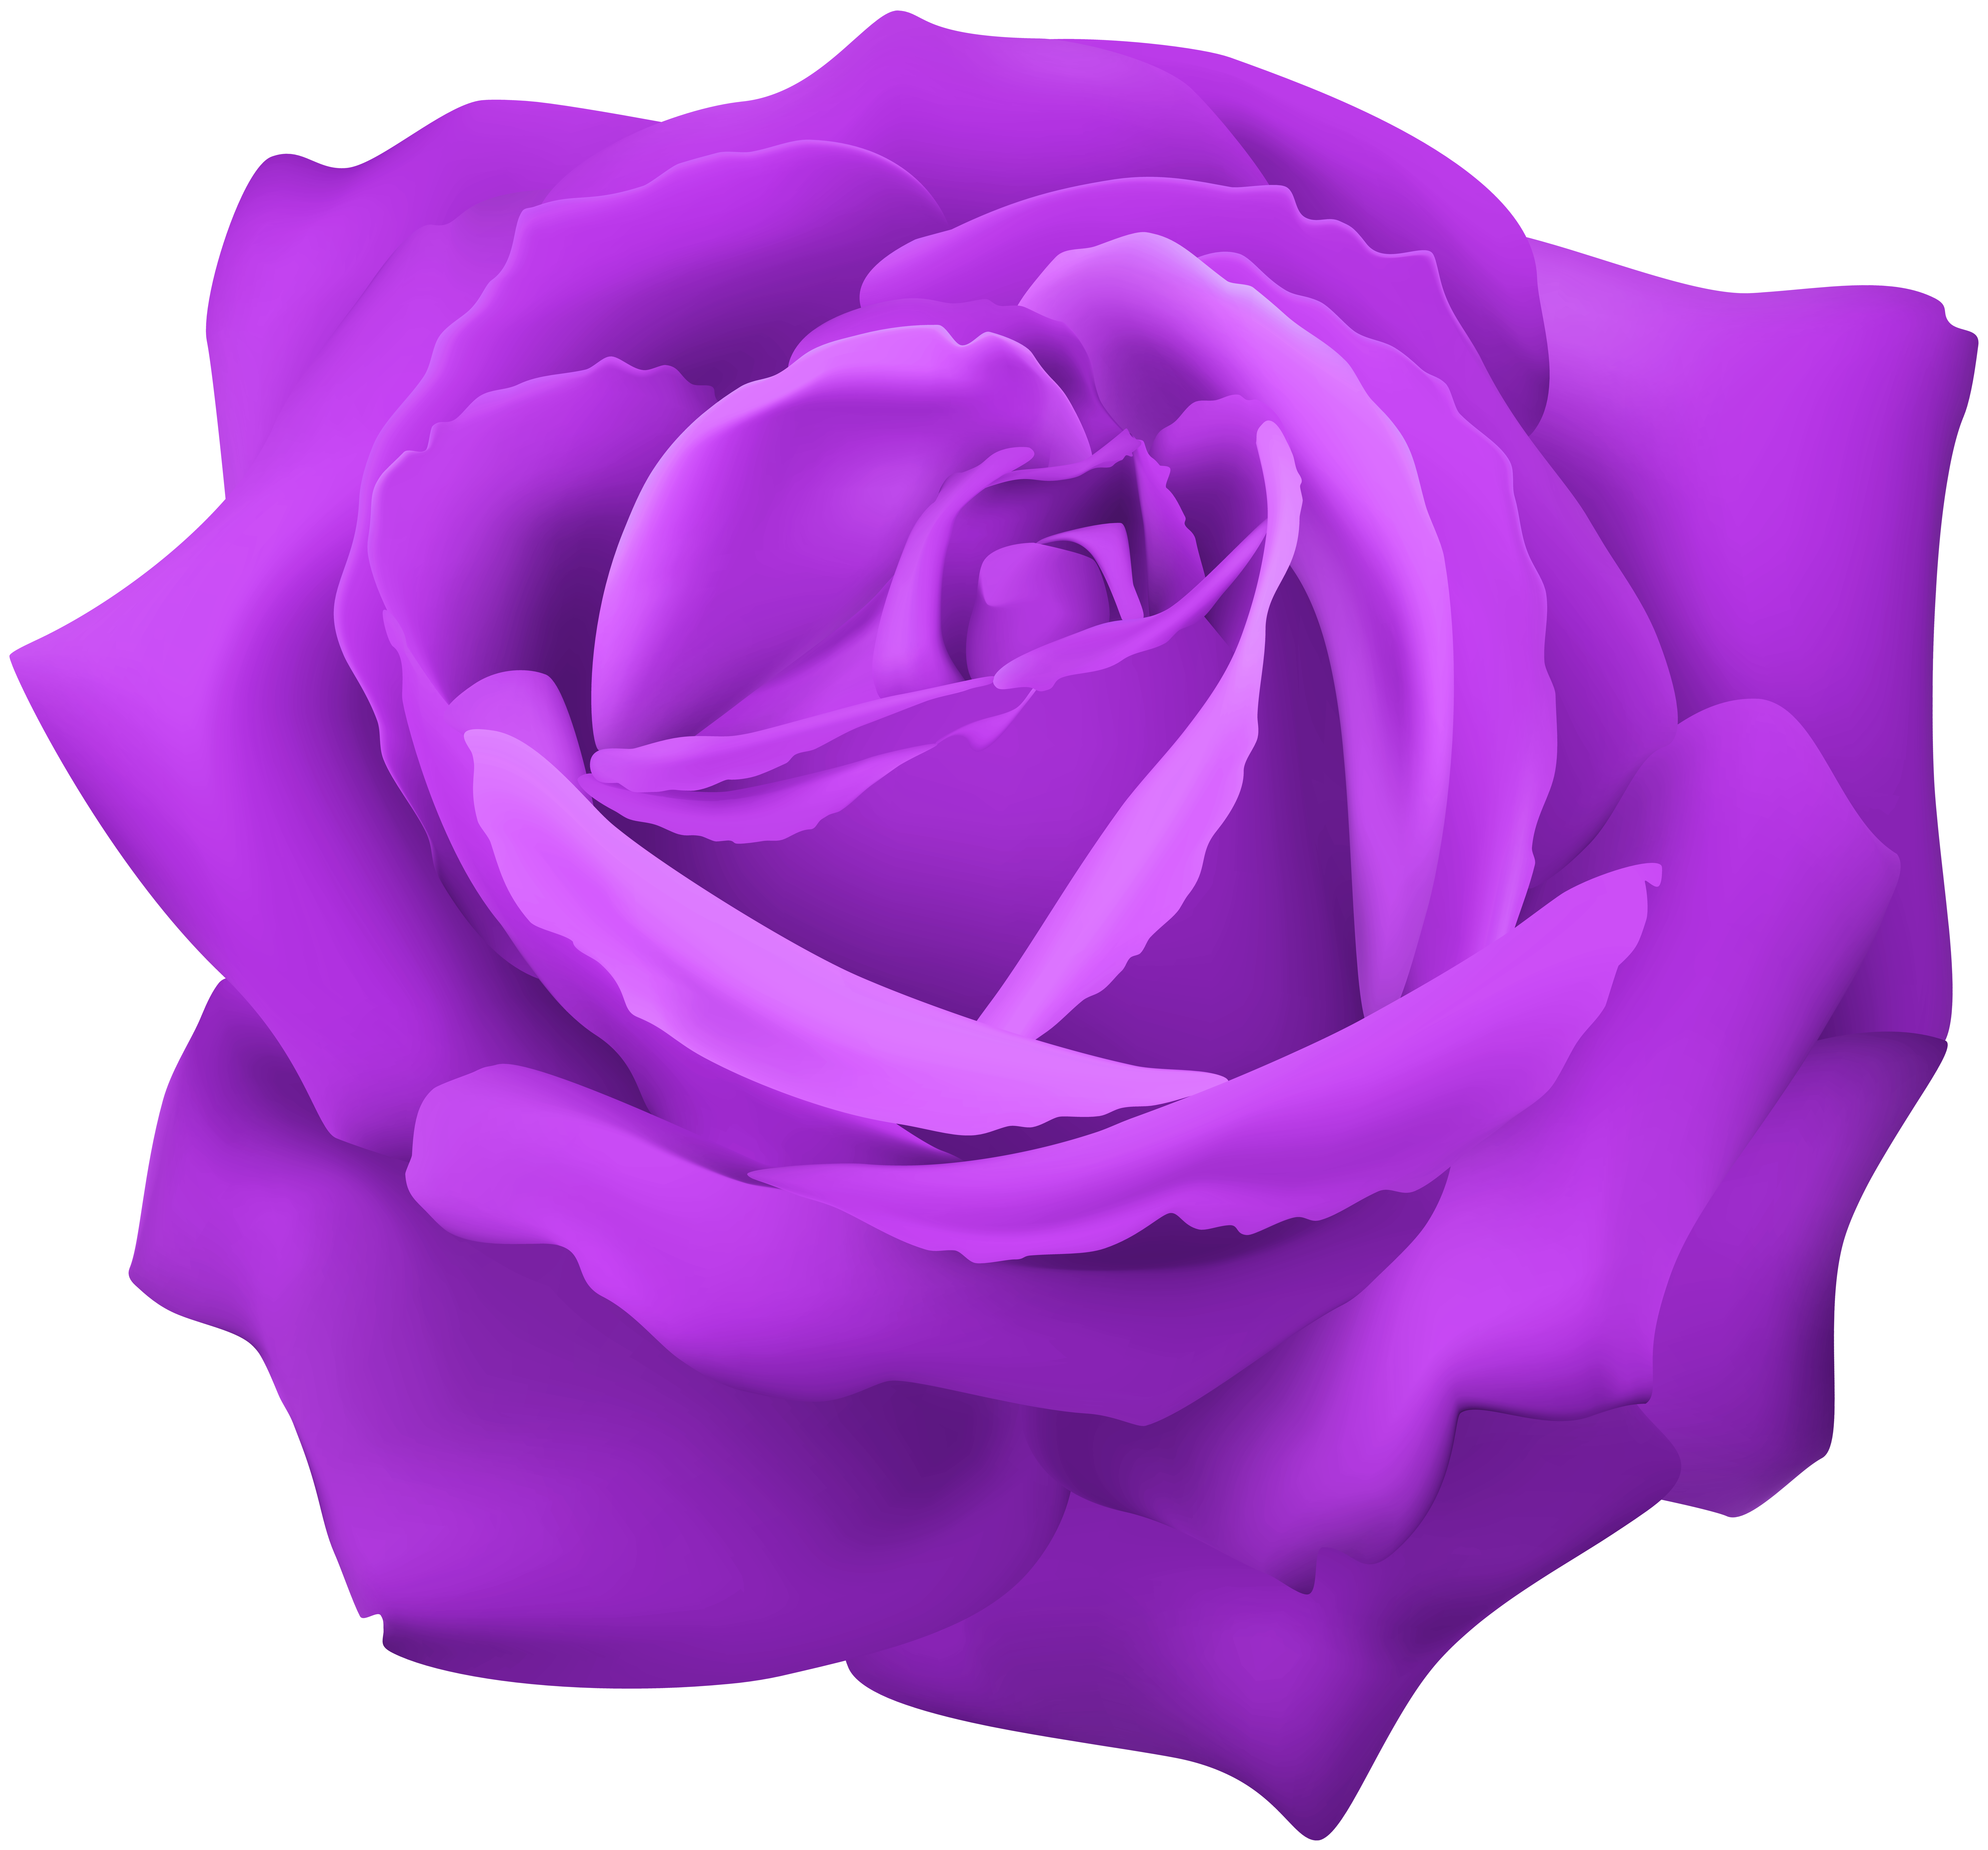 Purple Rose Flower Clip Art Image.